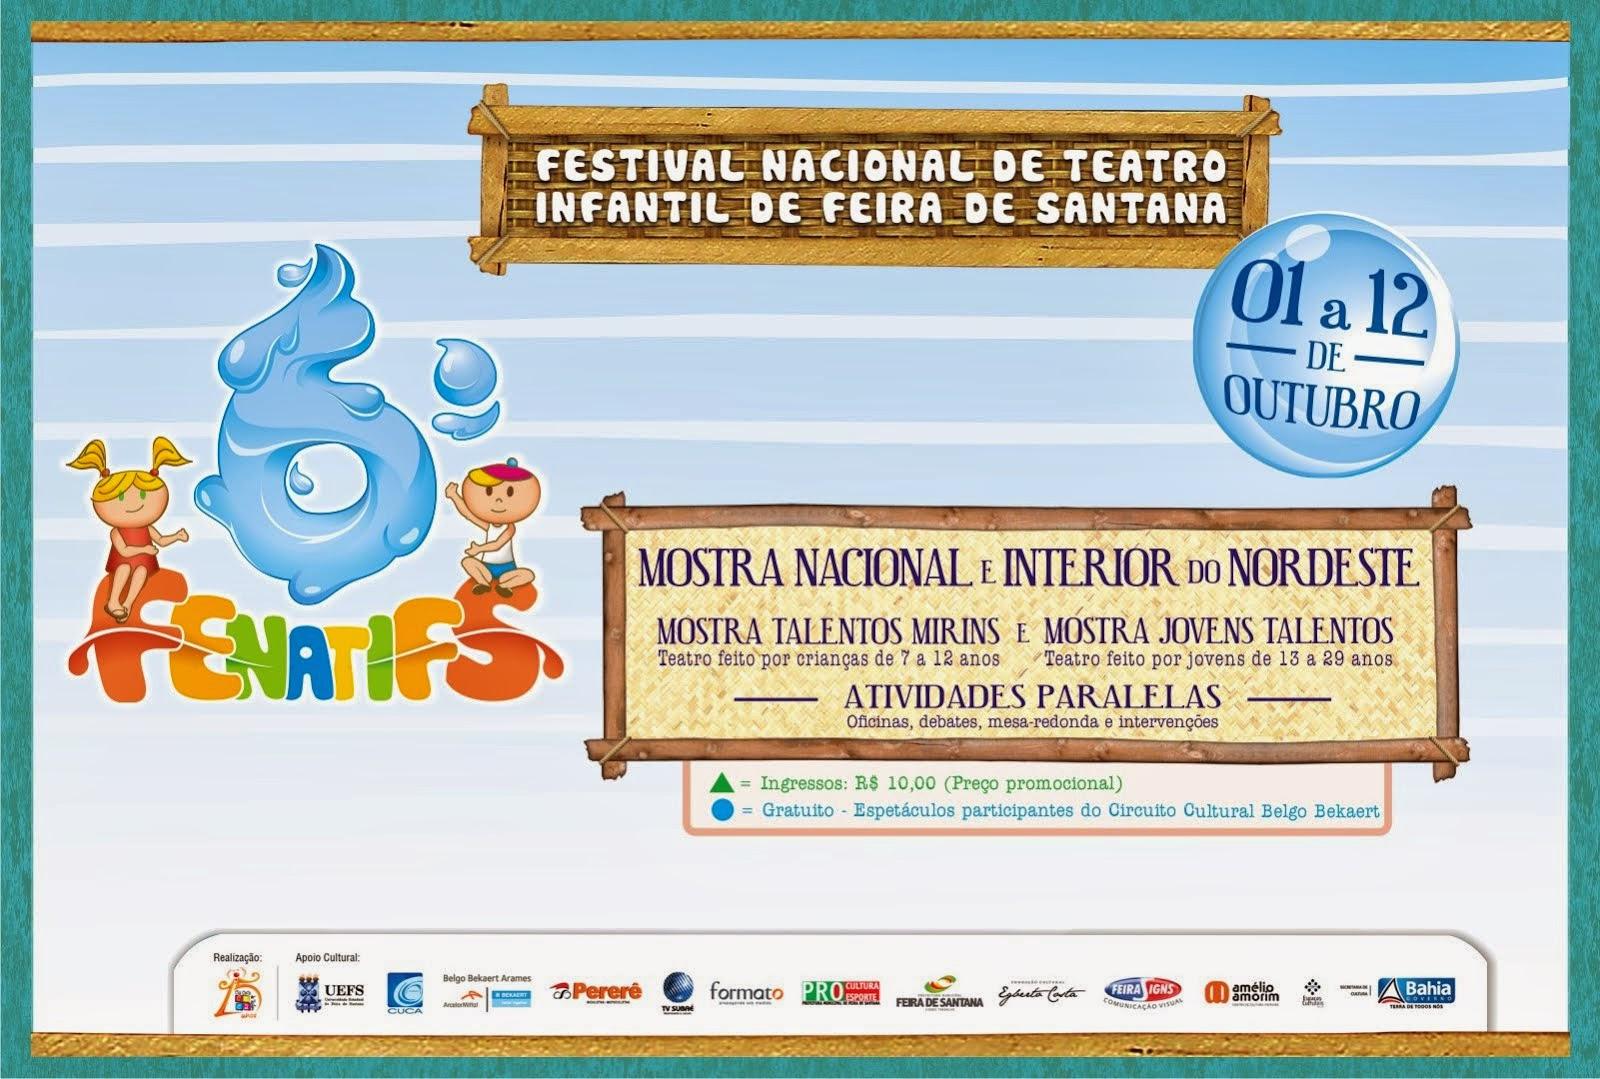 FESTIVAL NACIONAL DE TEATRO INFANTIL